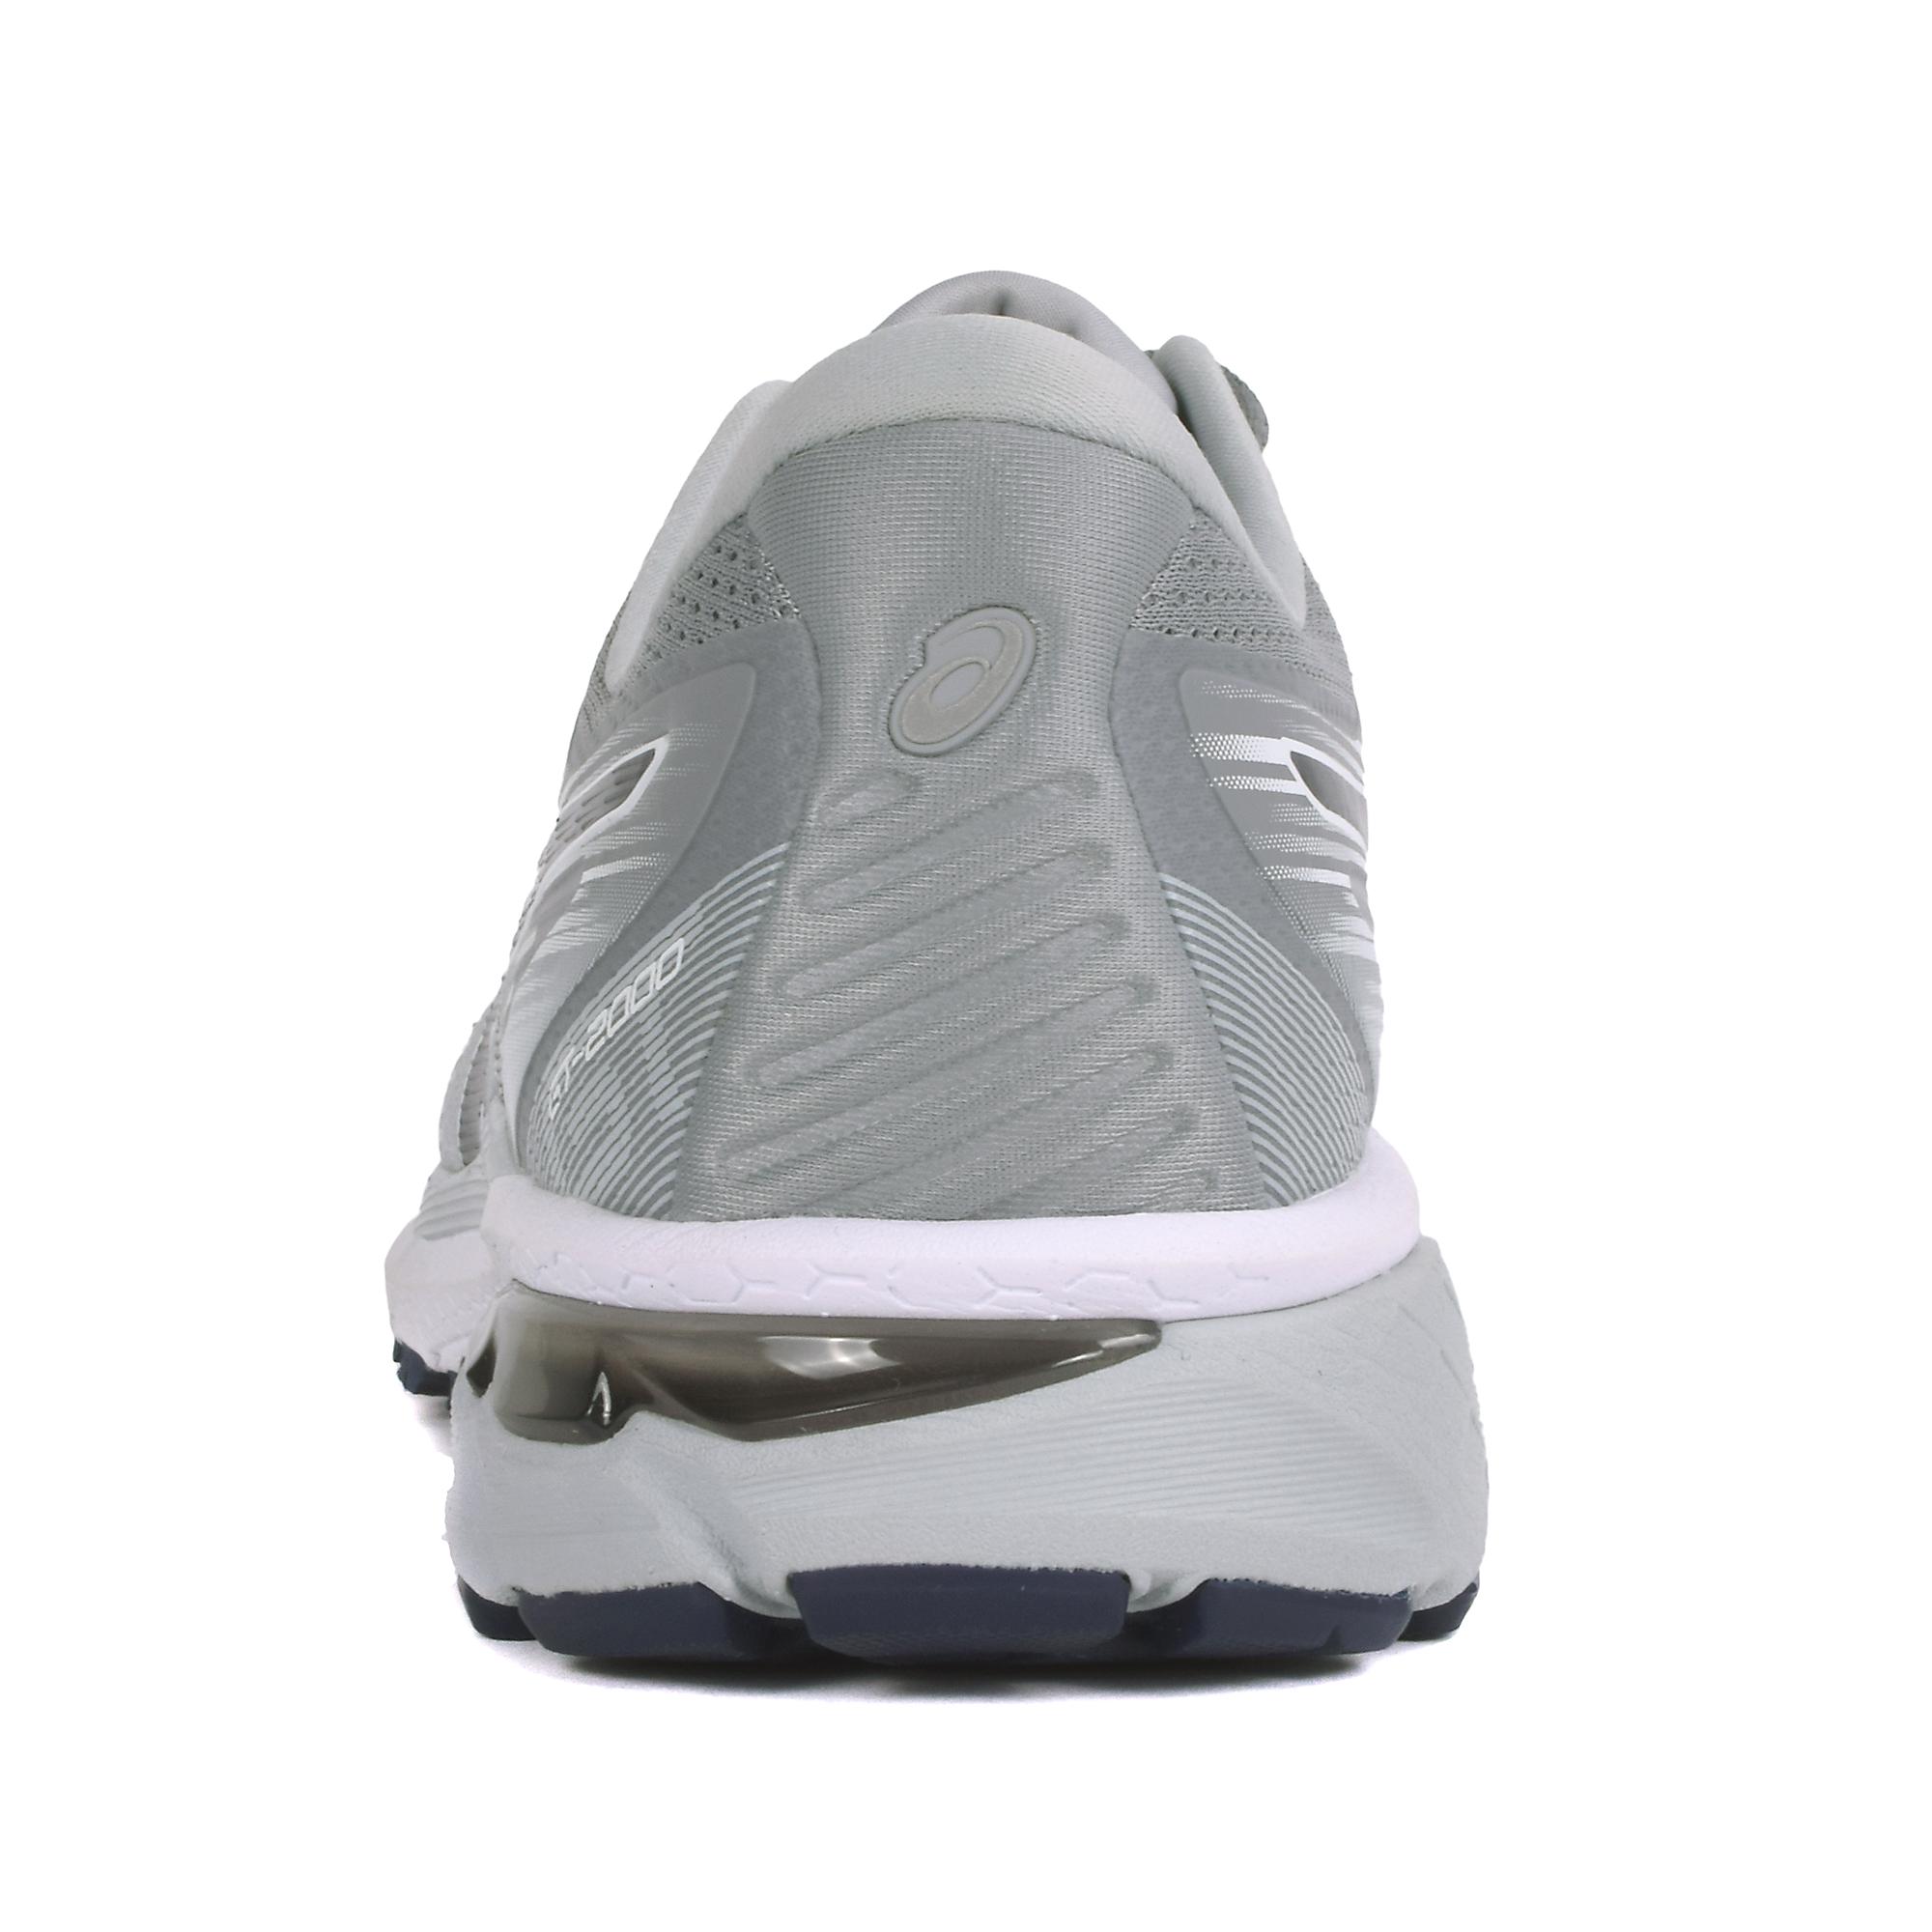 Men's Asics Gt-2000 8 Running Shoe - Color: Piedmont Grey (Regular Width) - Size: 7, Grey, large, image 2